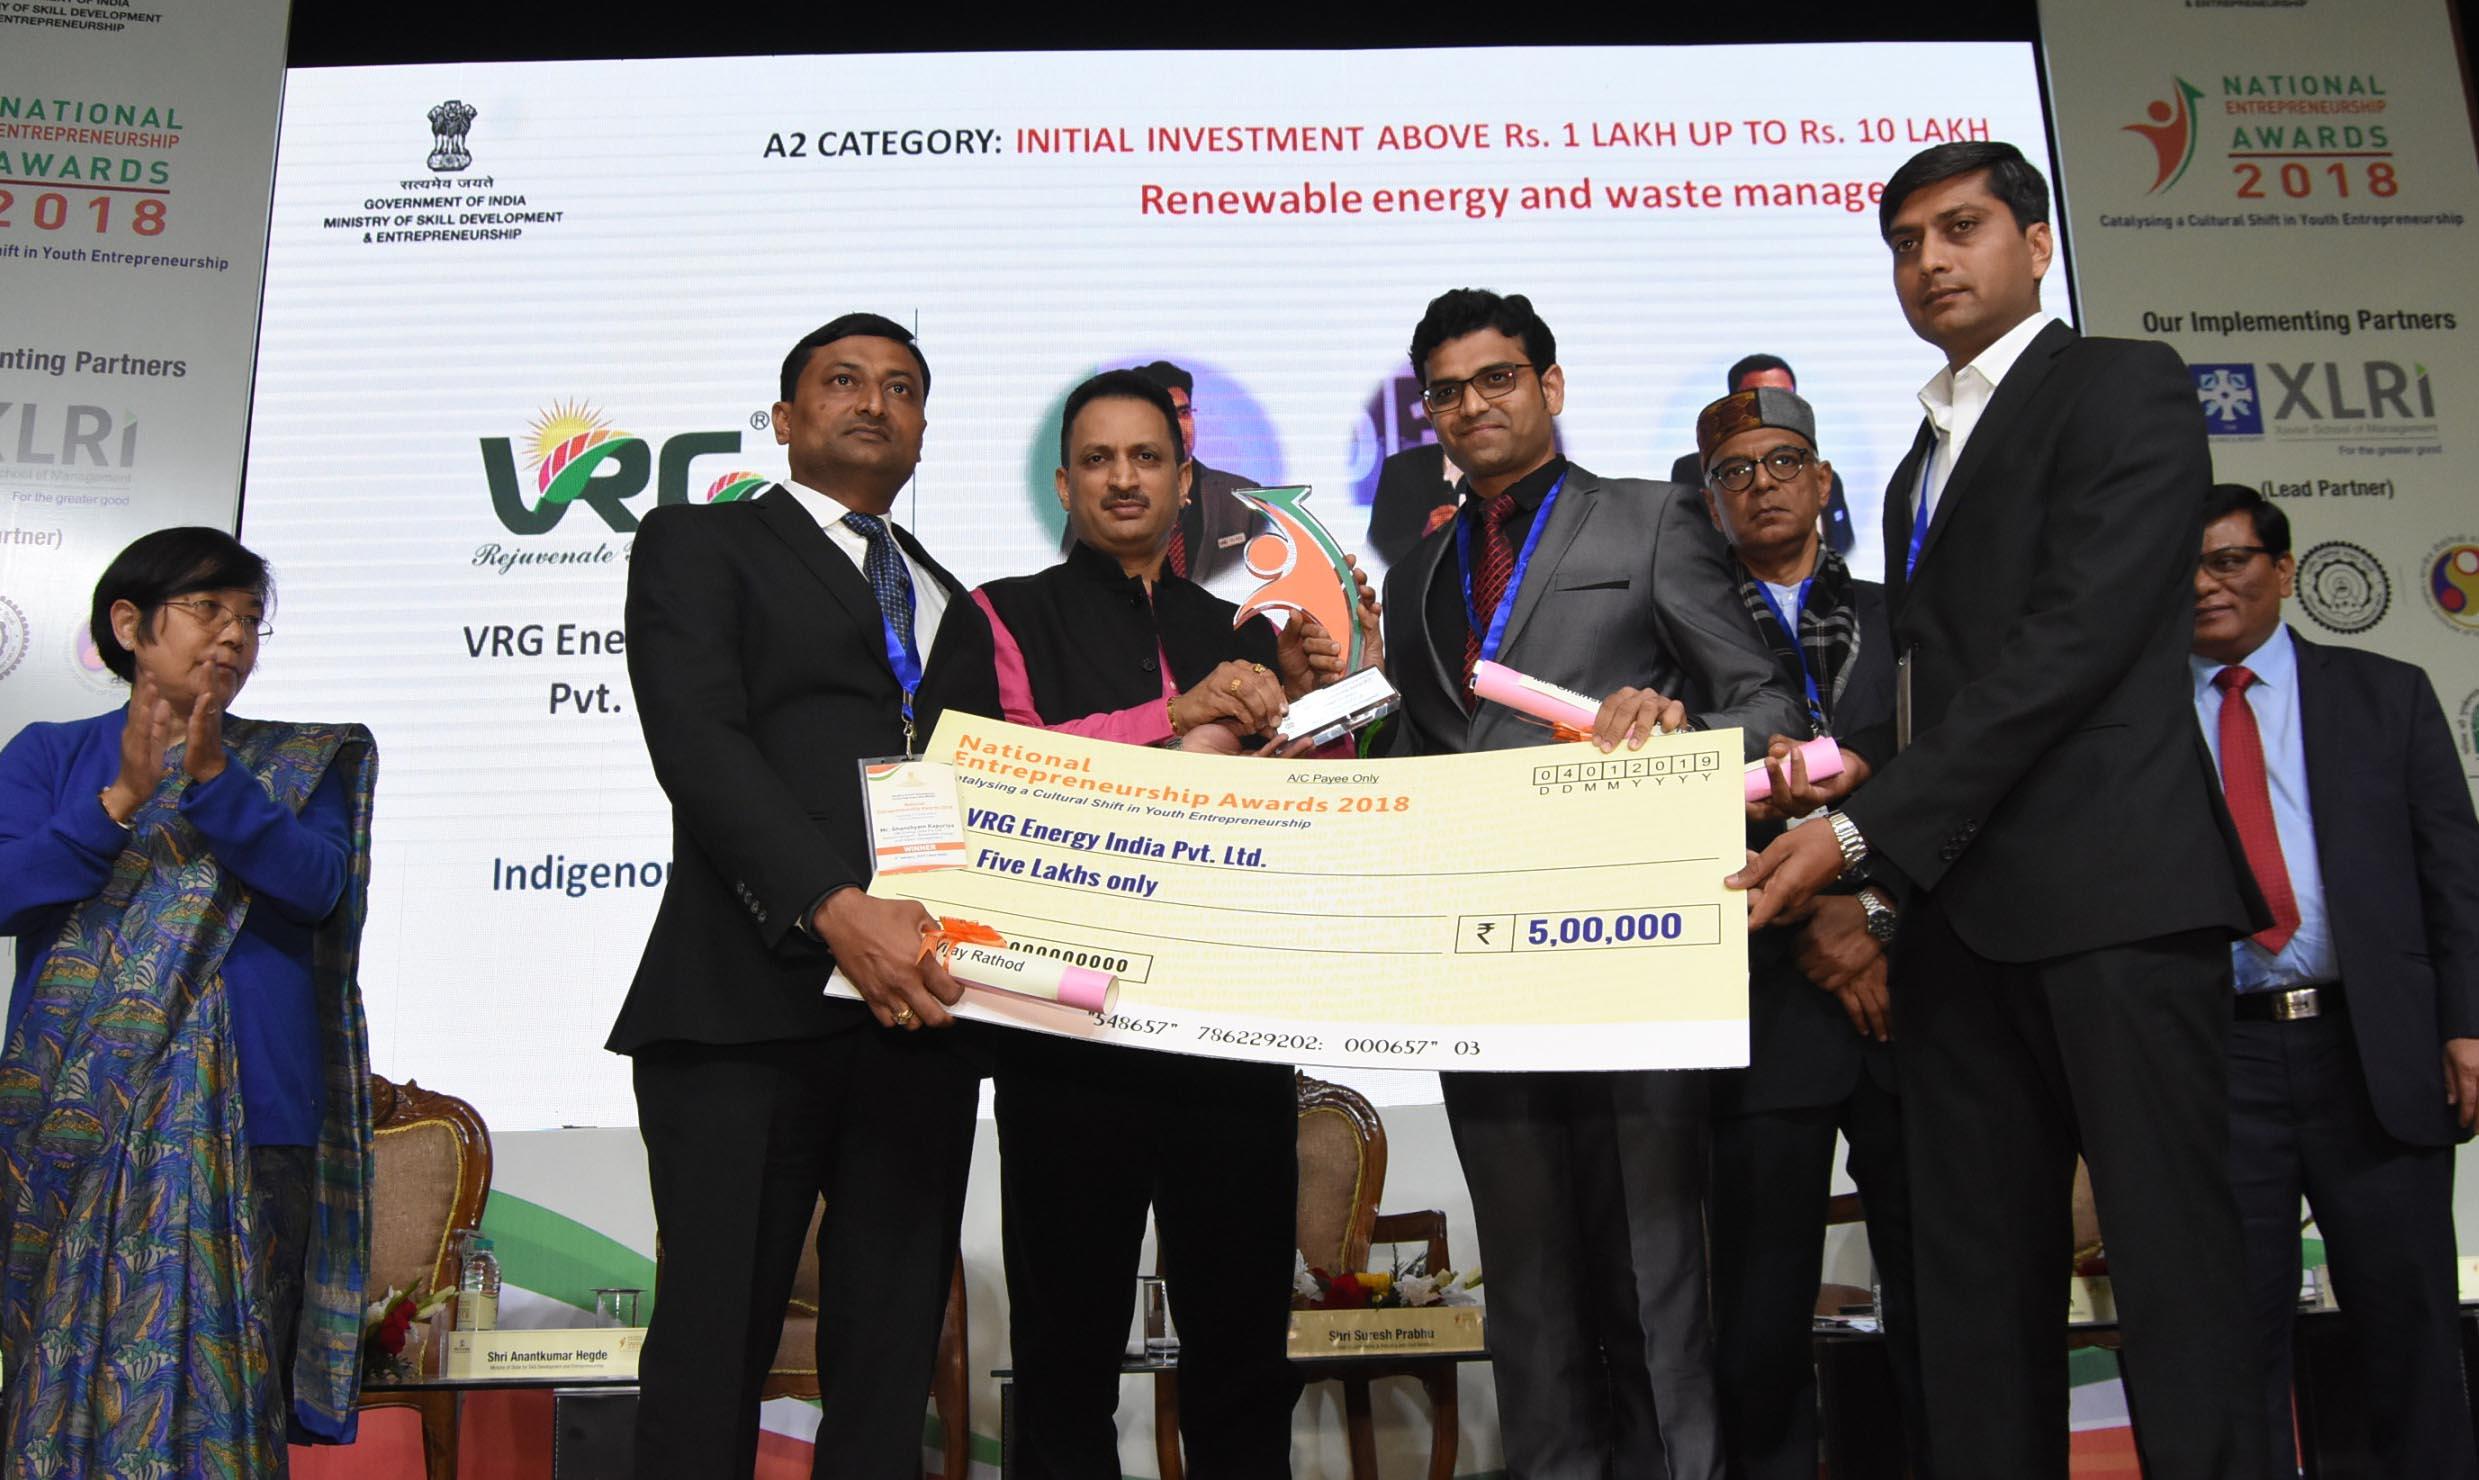 VRG Energy Received National Entrepreneurship Award in Renewable Energy and Waste management category